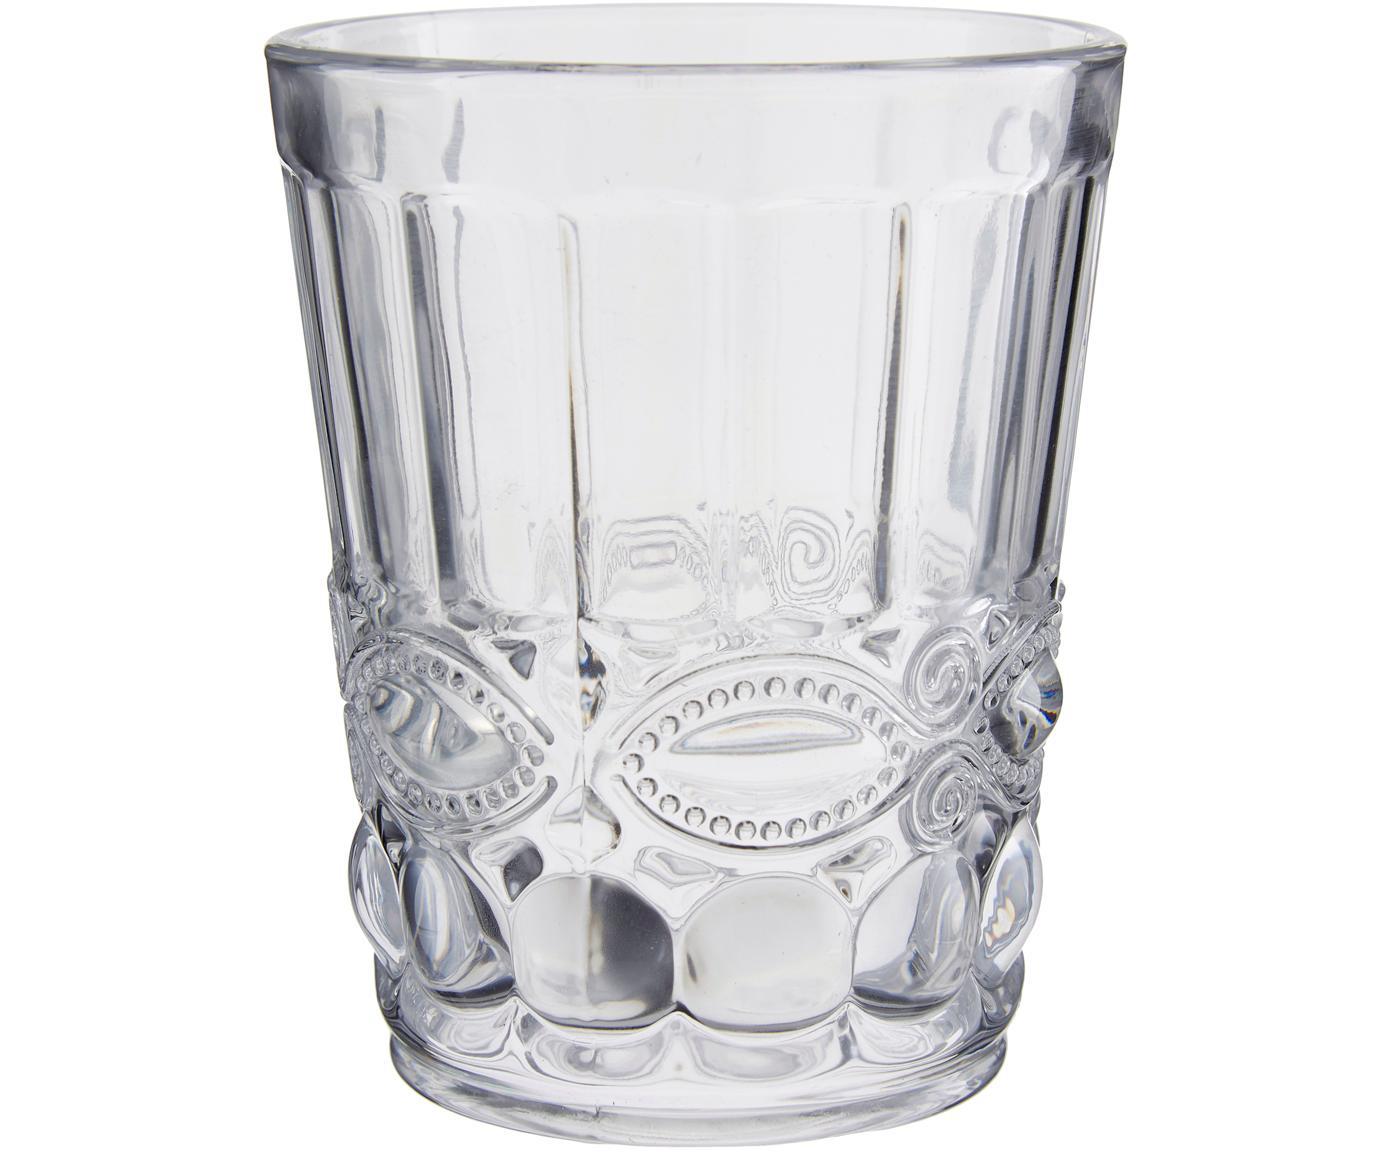 Vasos con relieve Nobilis, 6uds., Vidrio, Transparente, Ø 9 x Al 11 cm